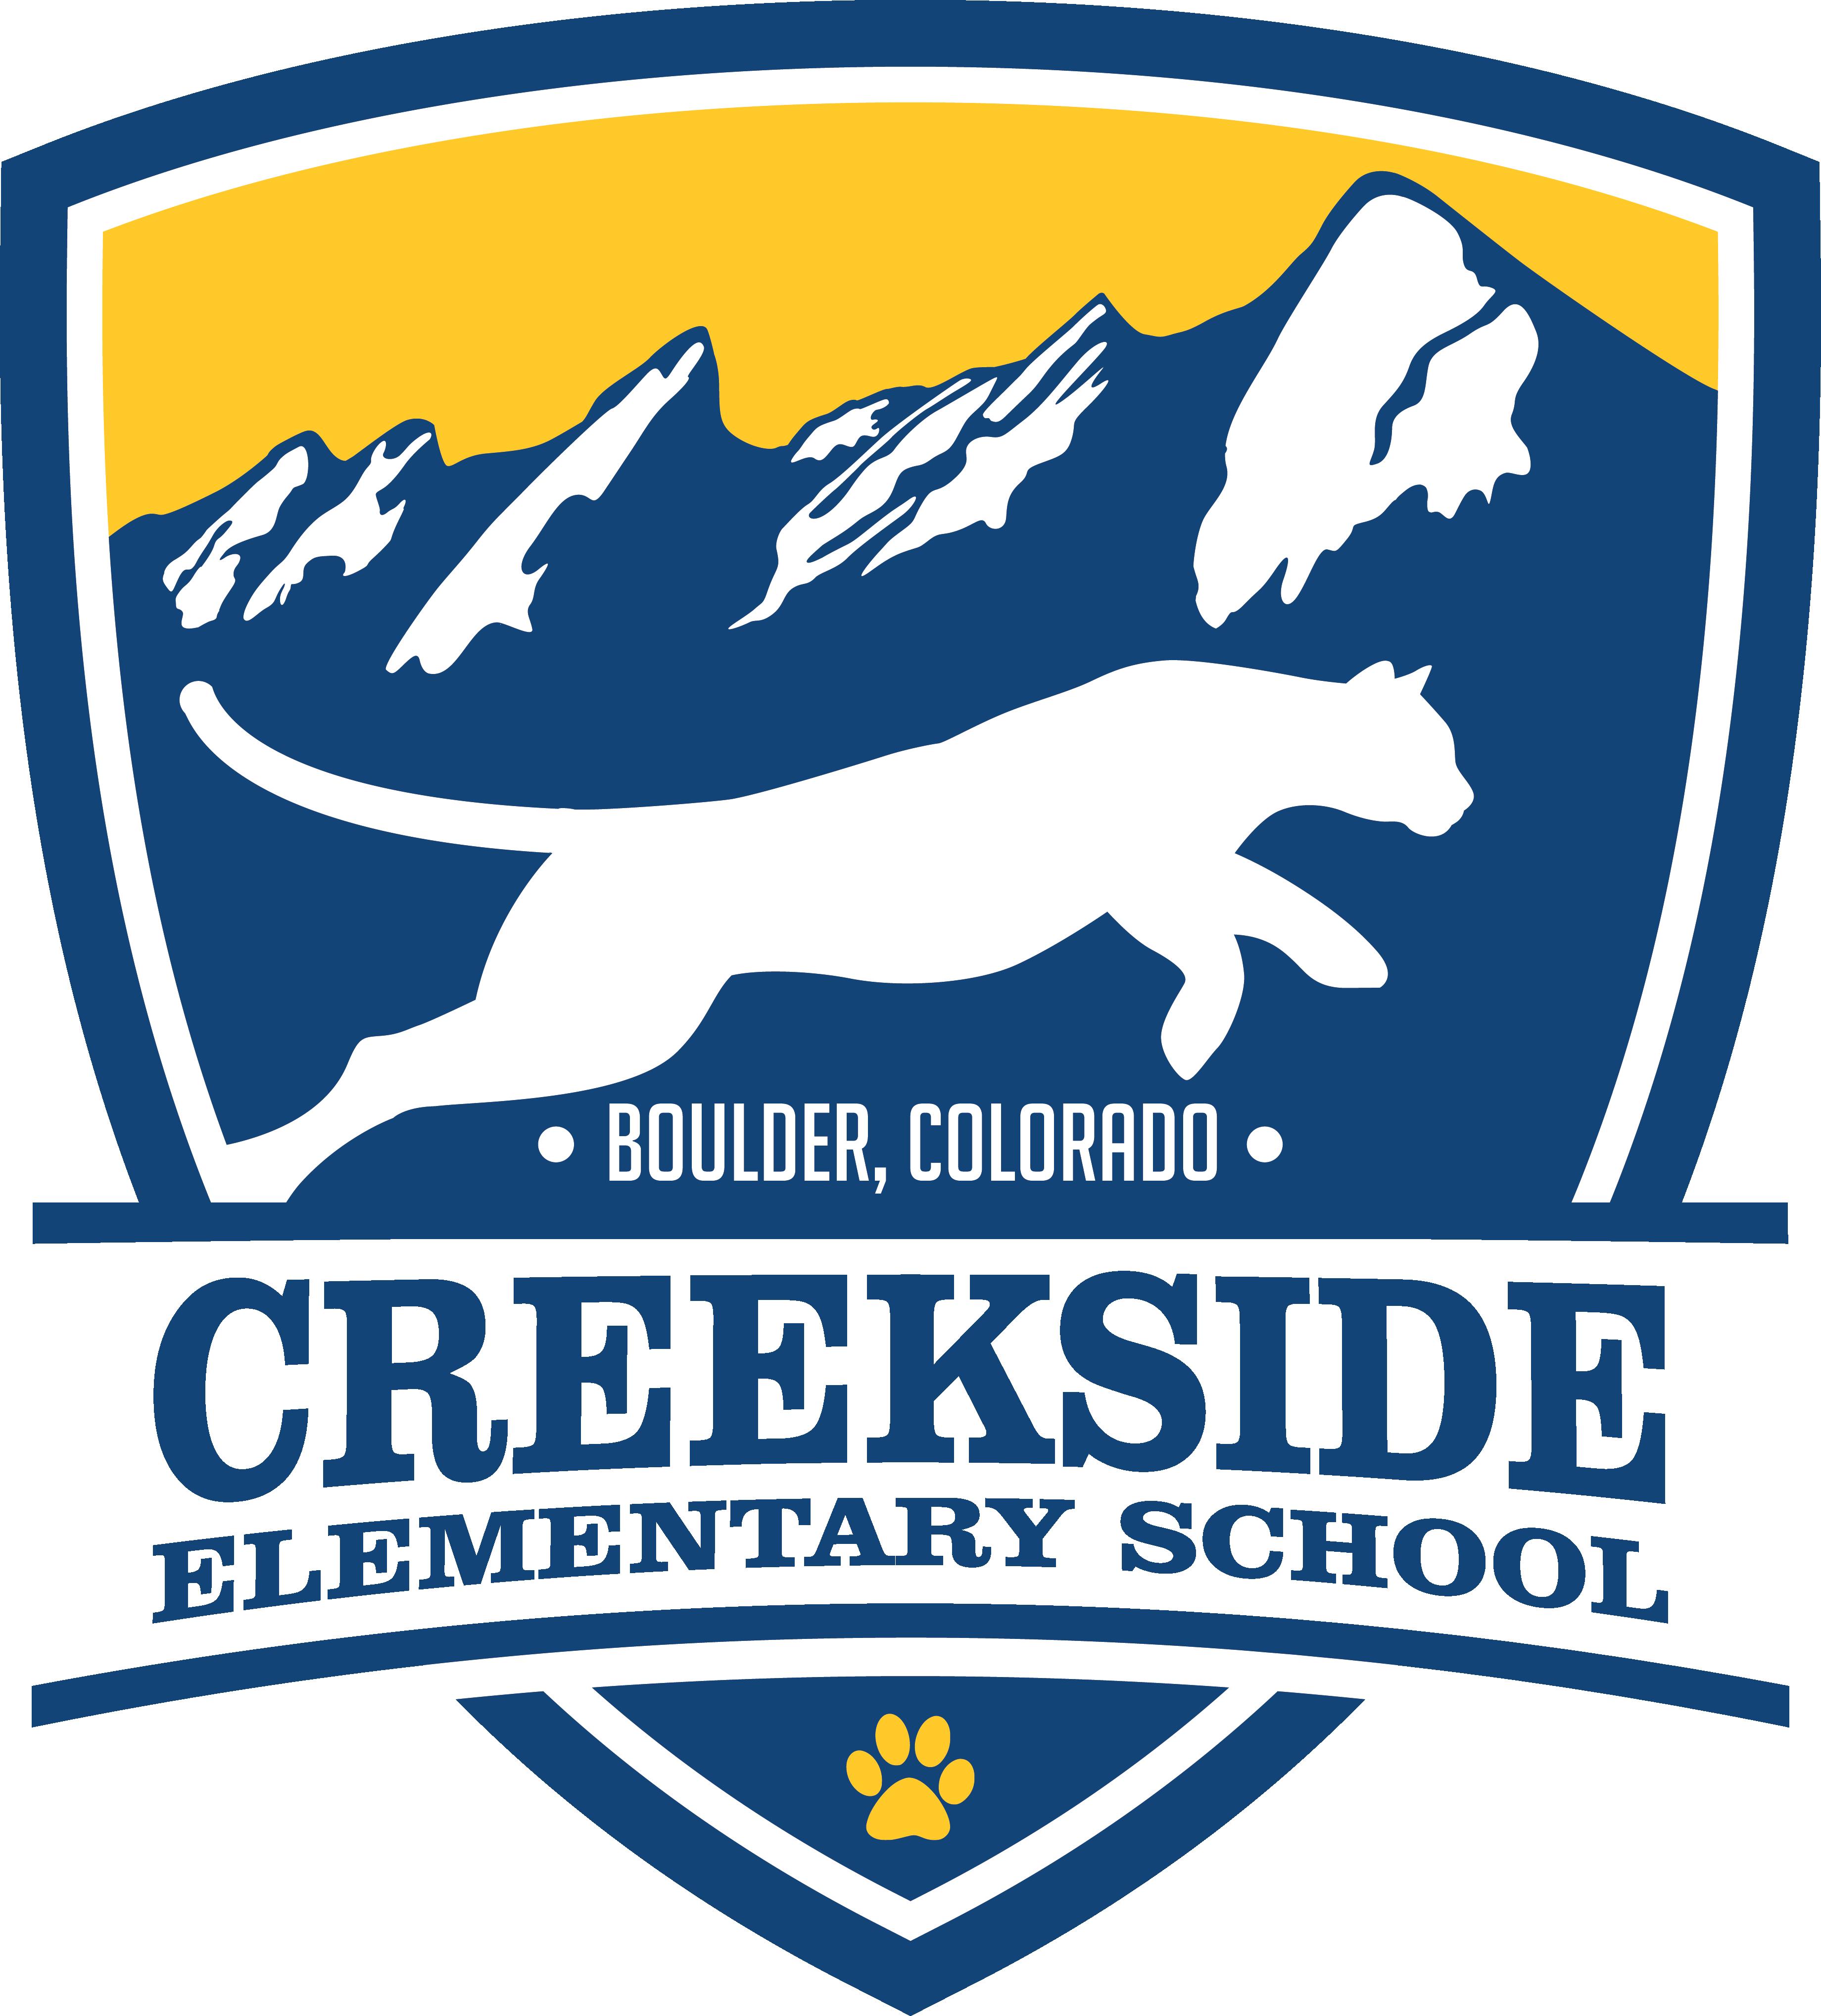 Diverse Elementary School in beautiful Boulder, Colorado needs new logo!!!